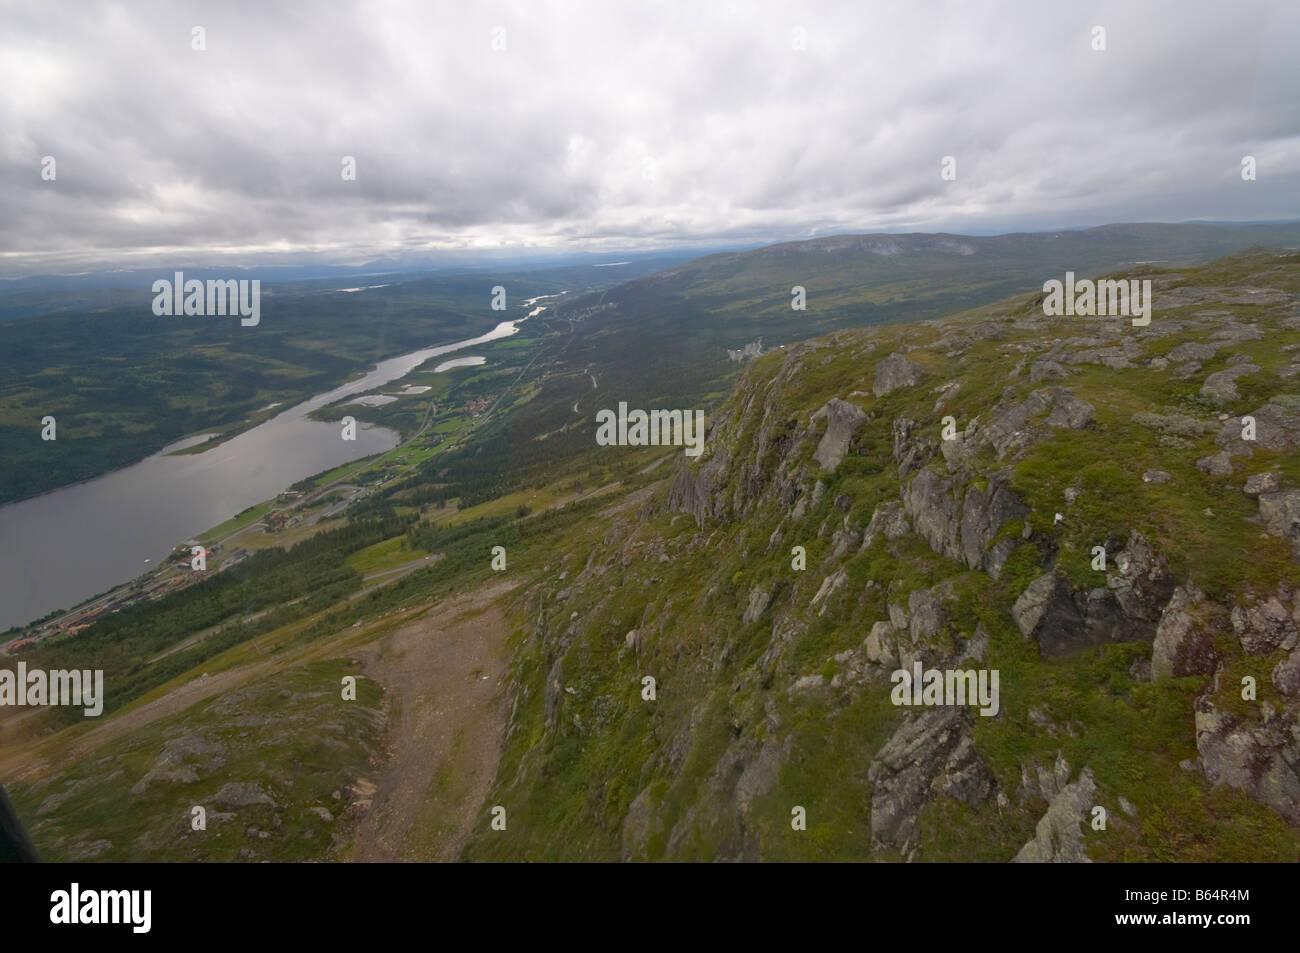 Teil des Indalsälven vom Åreskutan Berg gesehen. Stockbild